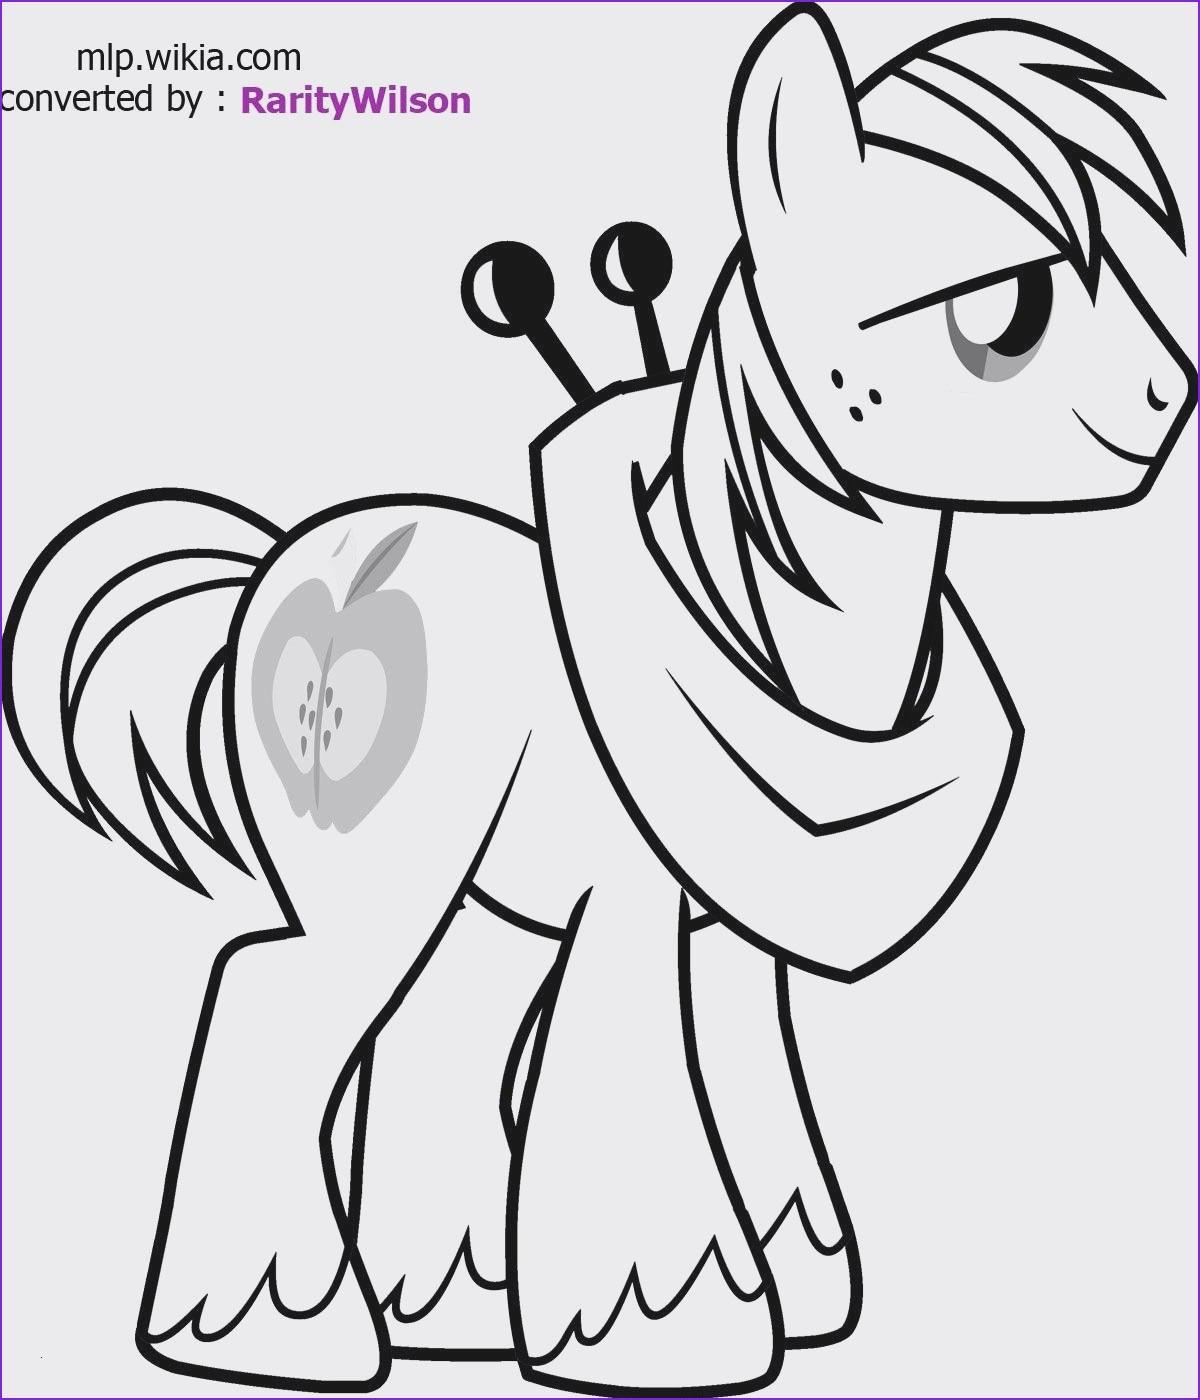 My Little Pony Friendship is Magic Ausmalbilder Frisch 40 My Little Pony Friendship is Magic Ausmalbilder Scoredatscore Stock